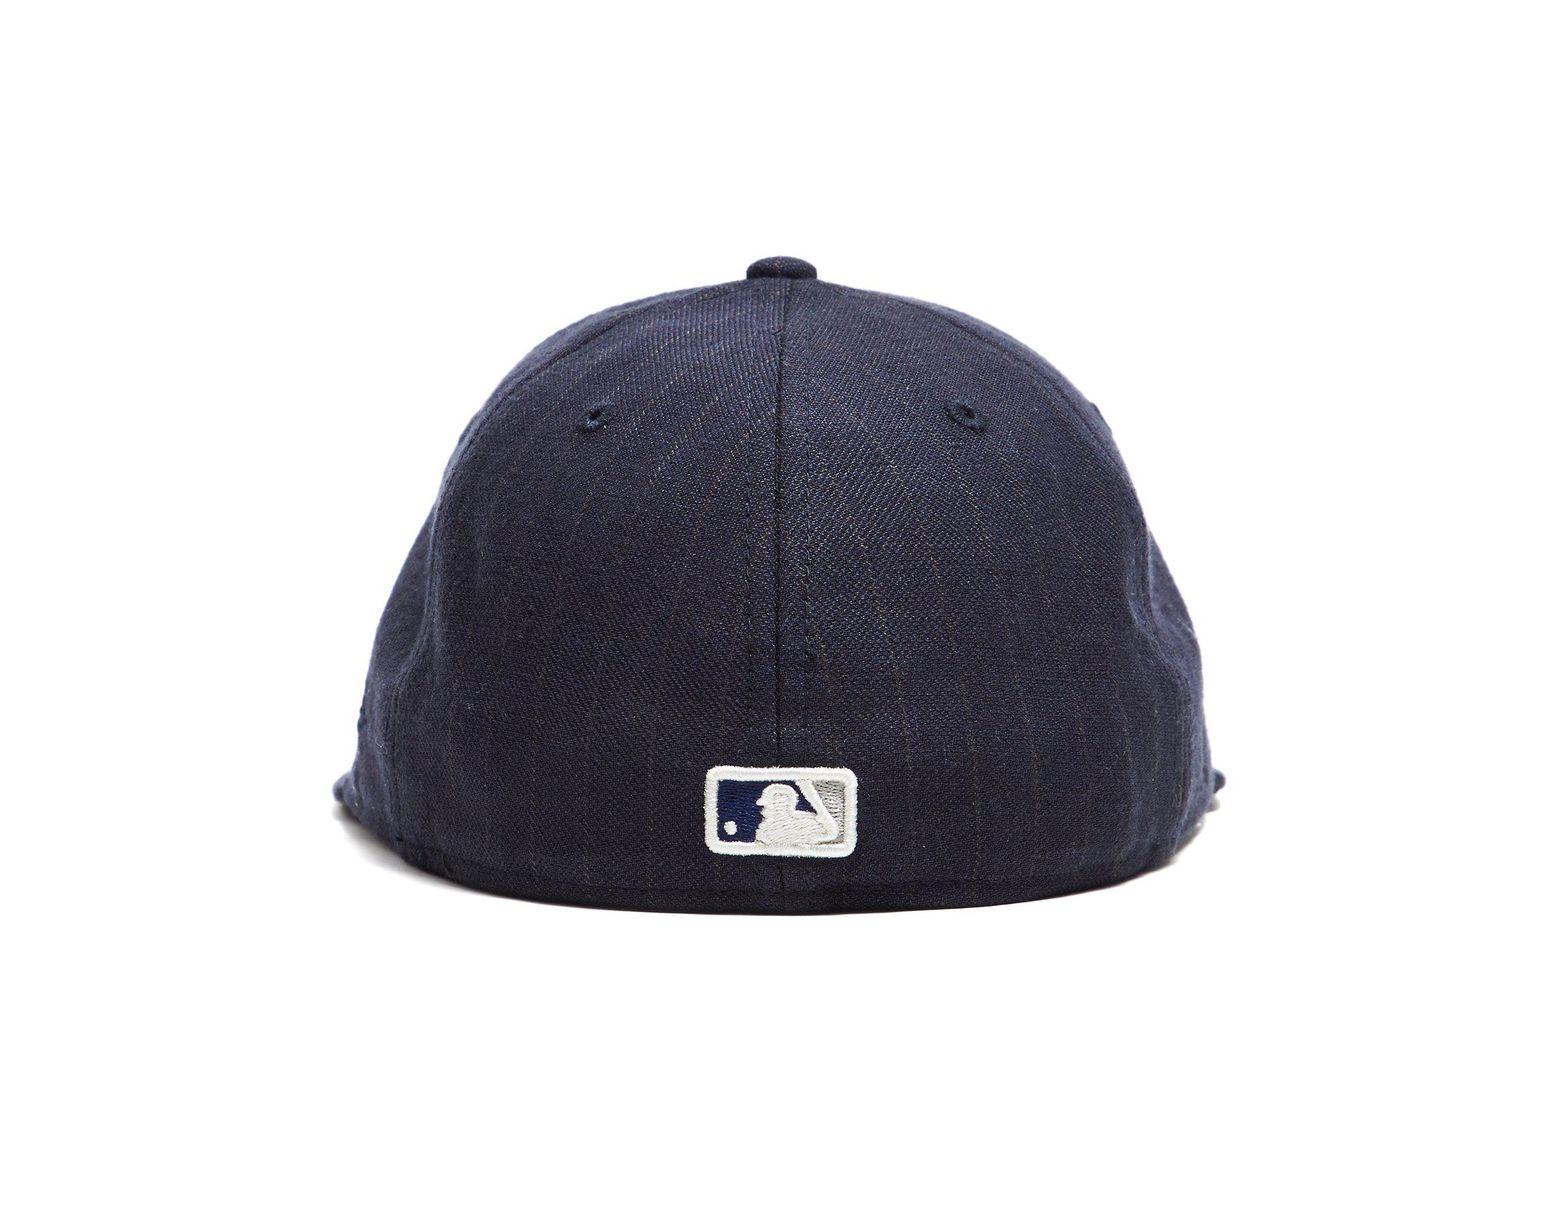 reputable site 45907 2528c NEW ERA HATS La Dodgers Cap In Navy Pinstripe in Blue for Men - Lyst